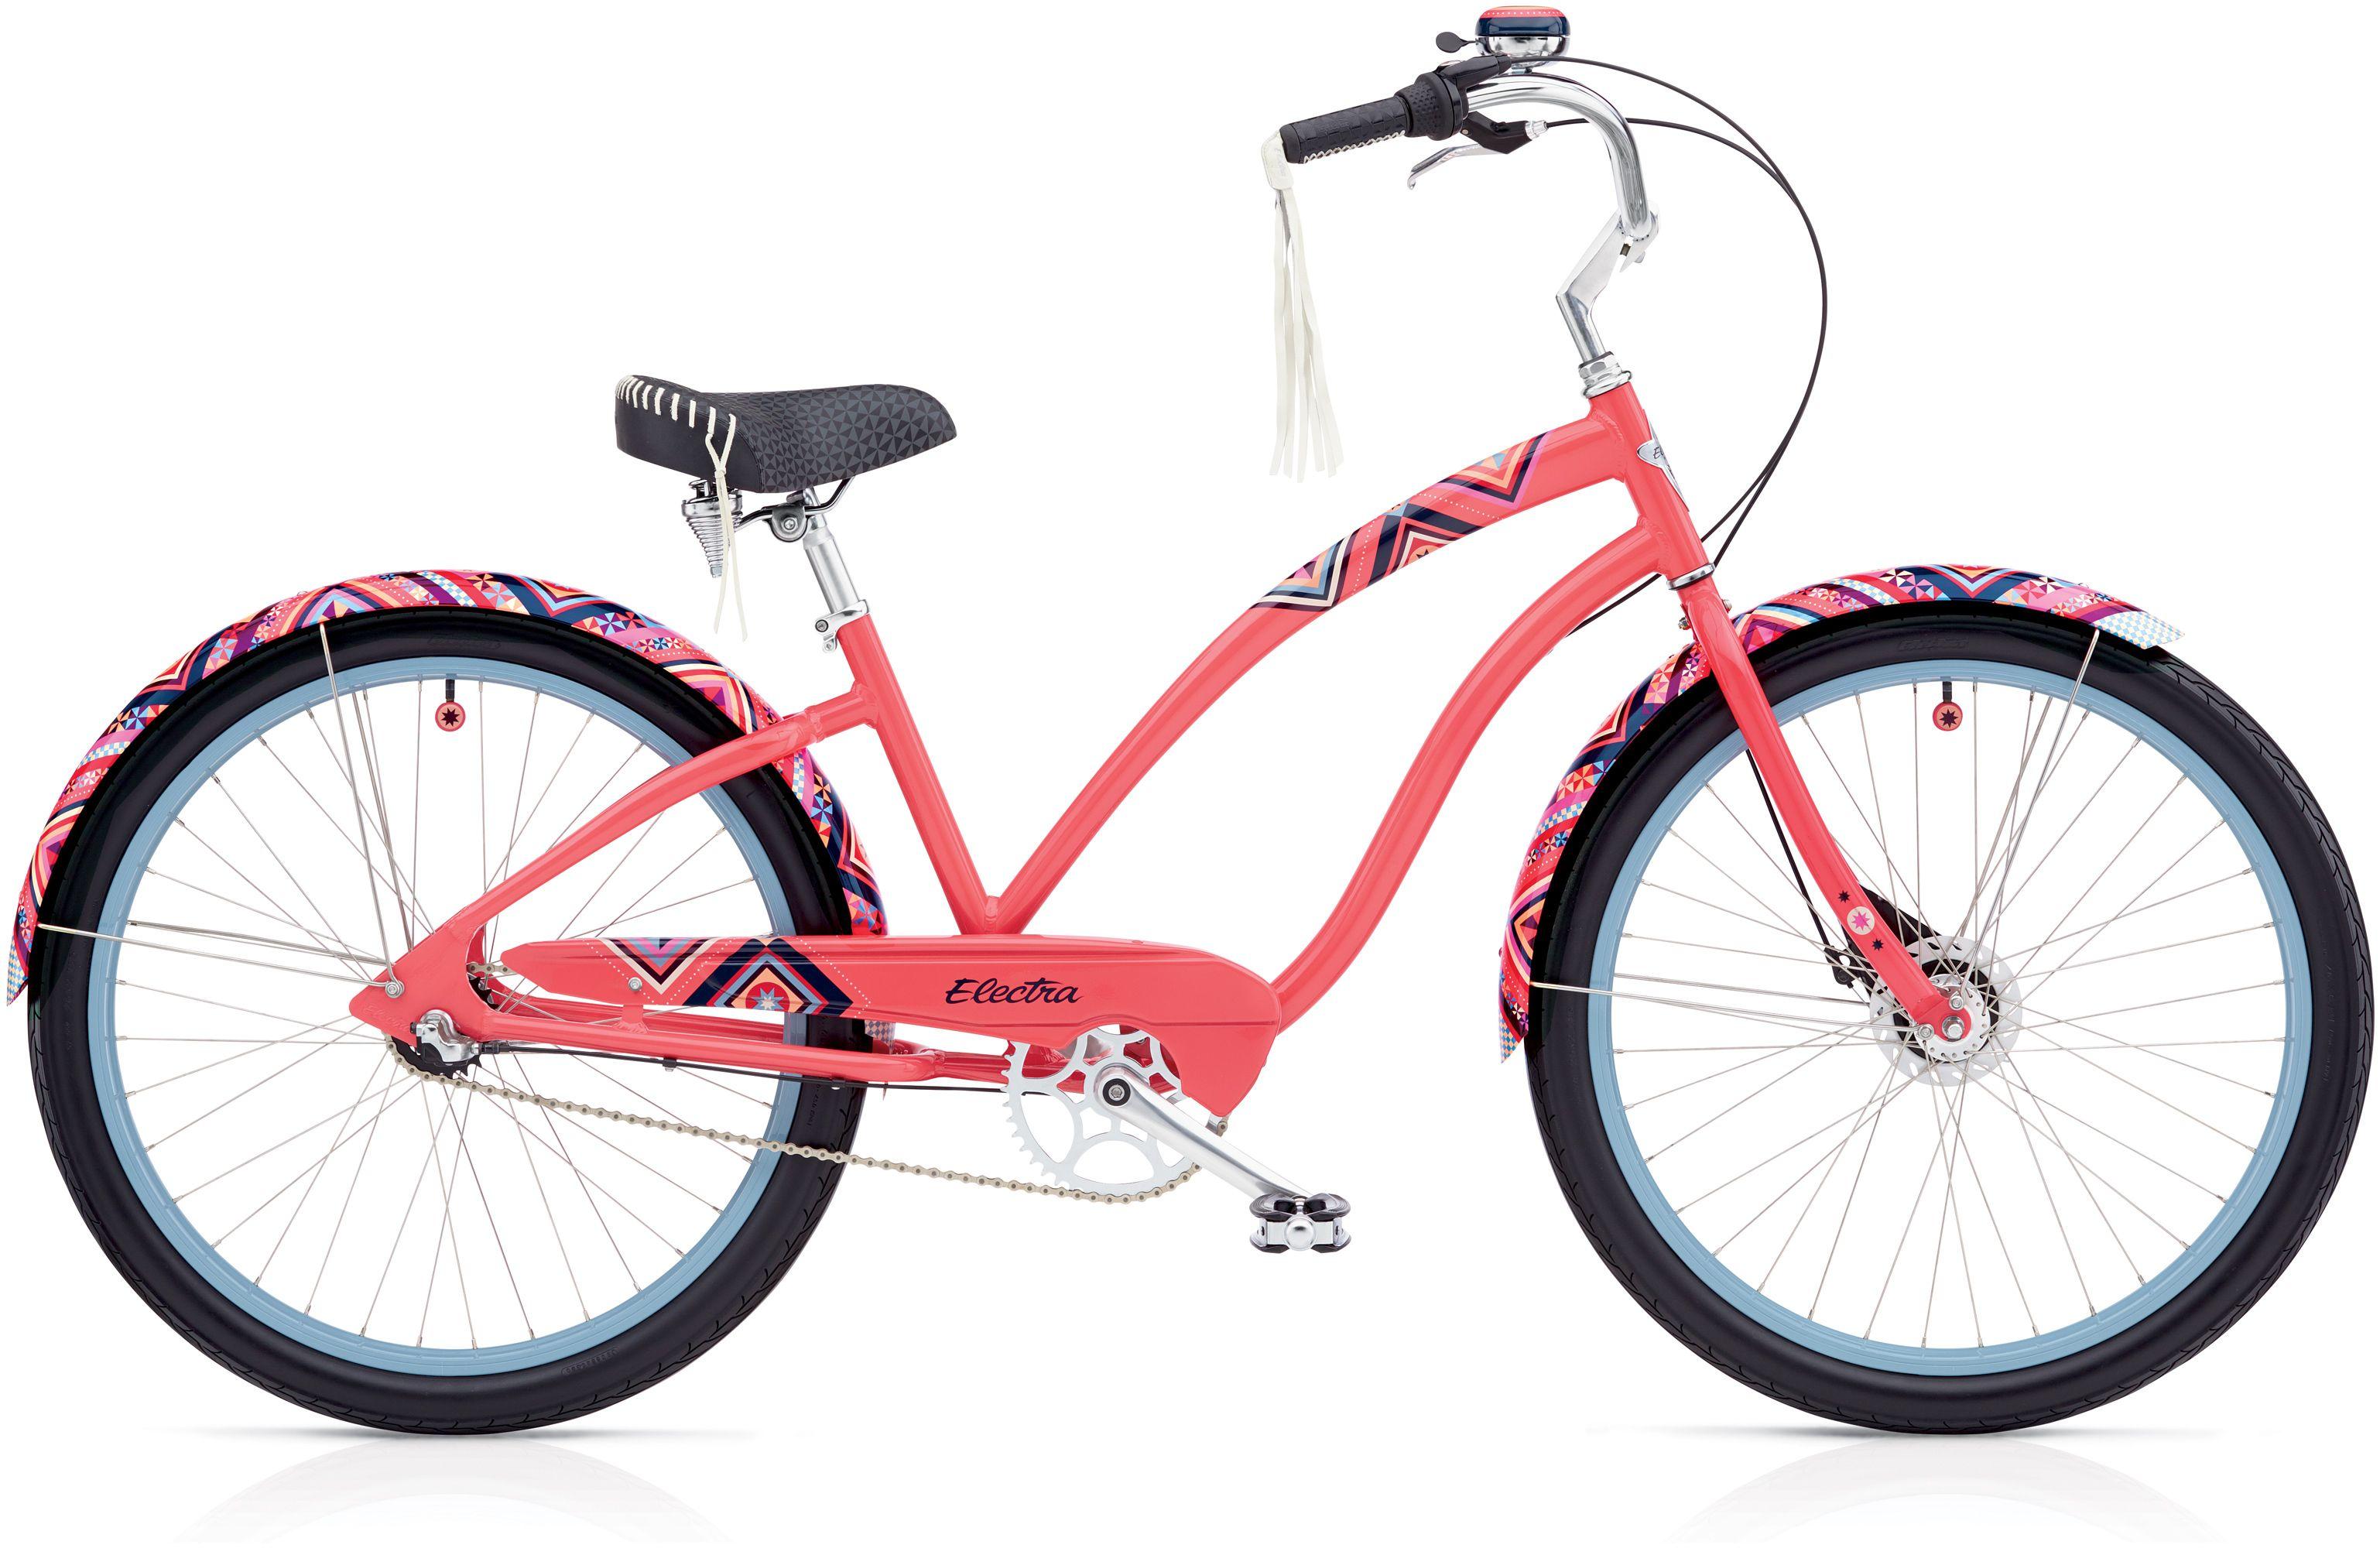 Велосипед Electra Morning Star 3i Ladies 2017 велосипед electra britania ladies 2017